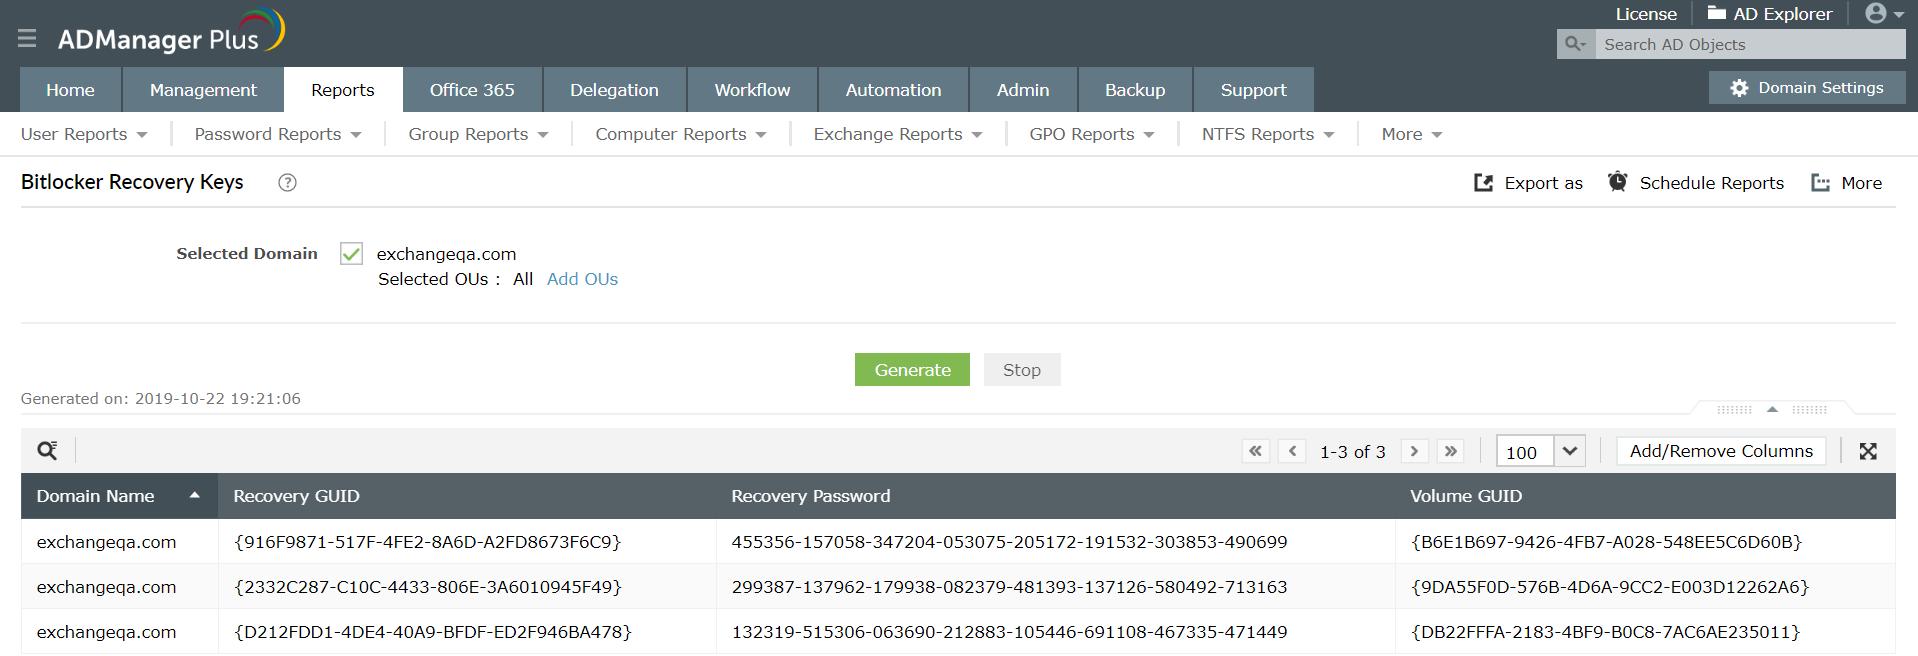 BitLocker recovery key reports